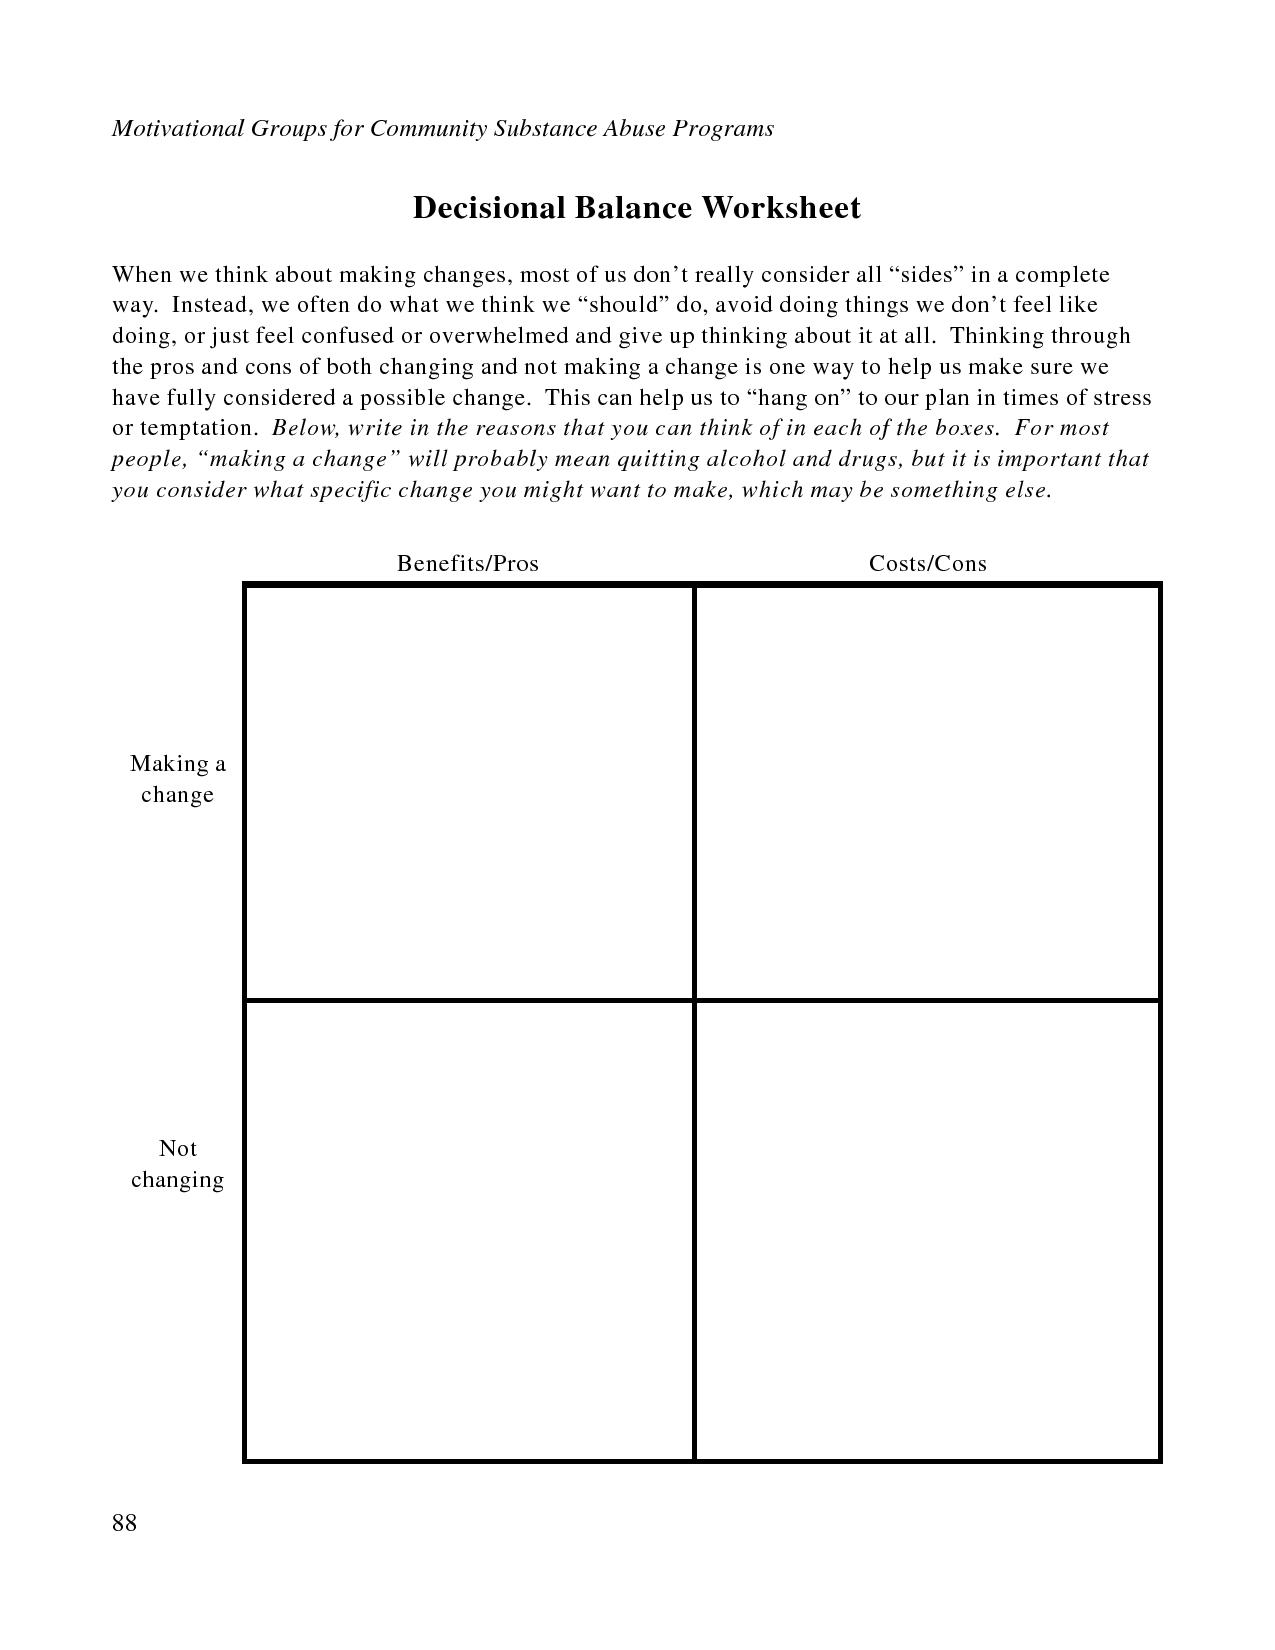 Free Printable Dbt Worksheets | Decisional Balance Worksheet - Pdf - Free Printable Therapy Worksheets